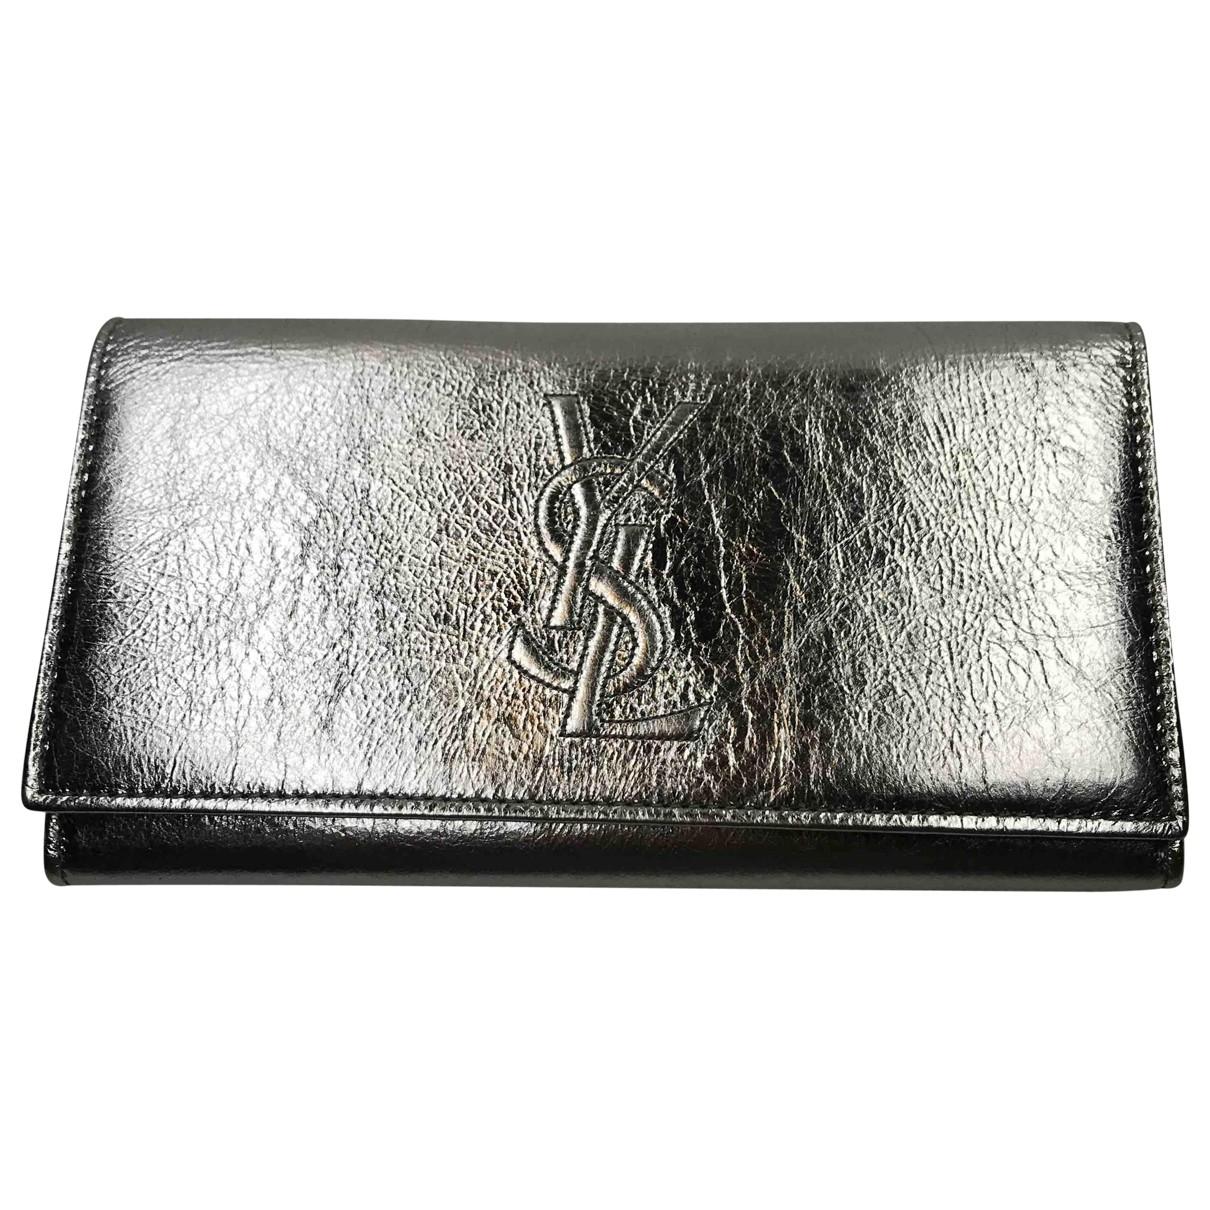 Saint Laurent \N Silver Leather wallet for Women \N